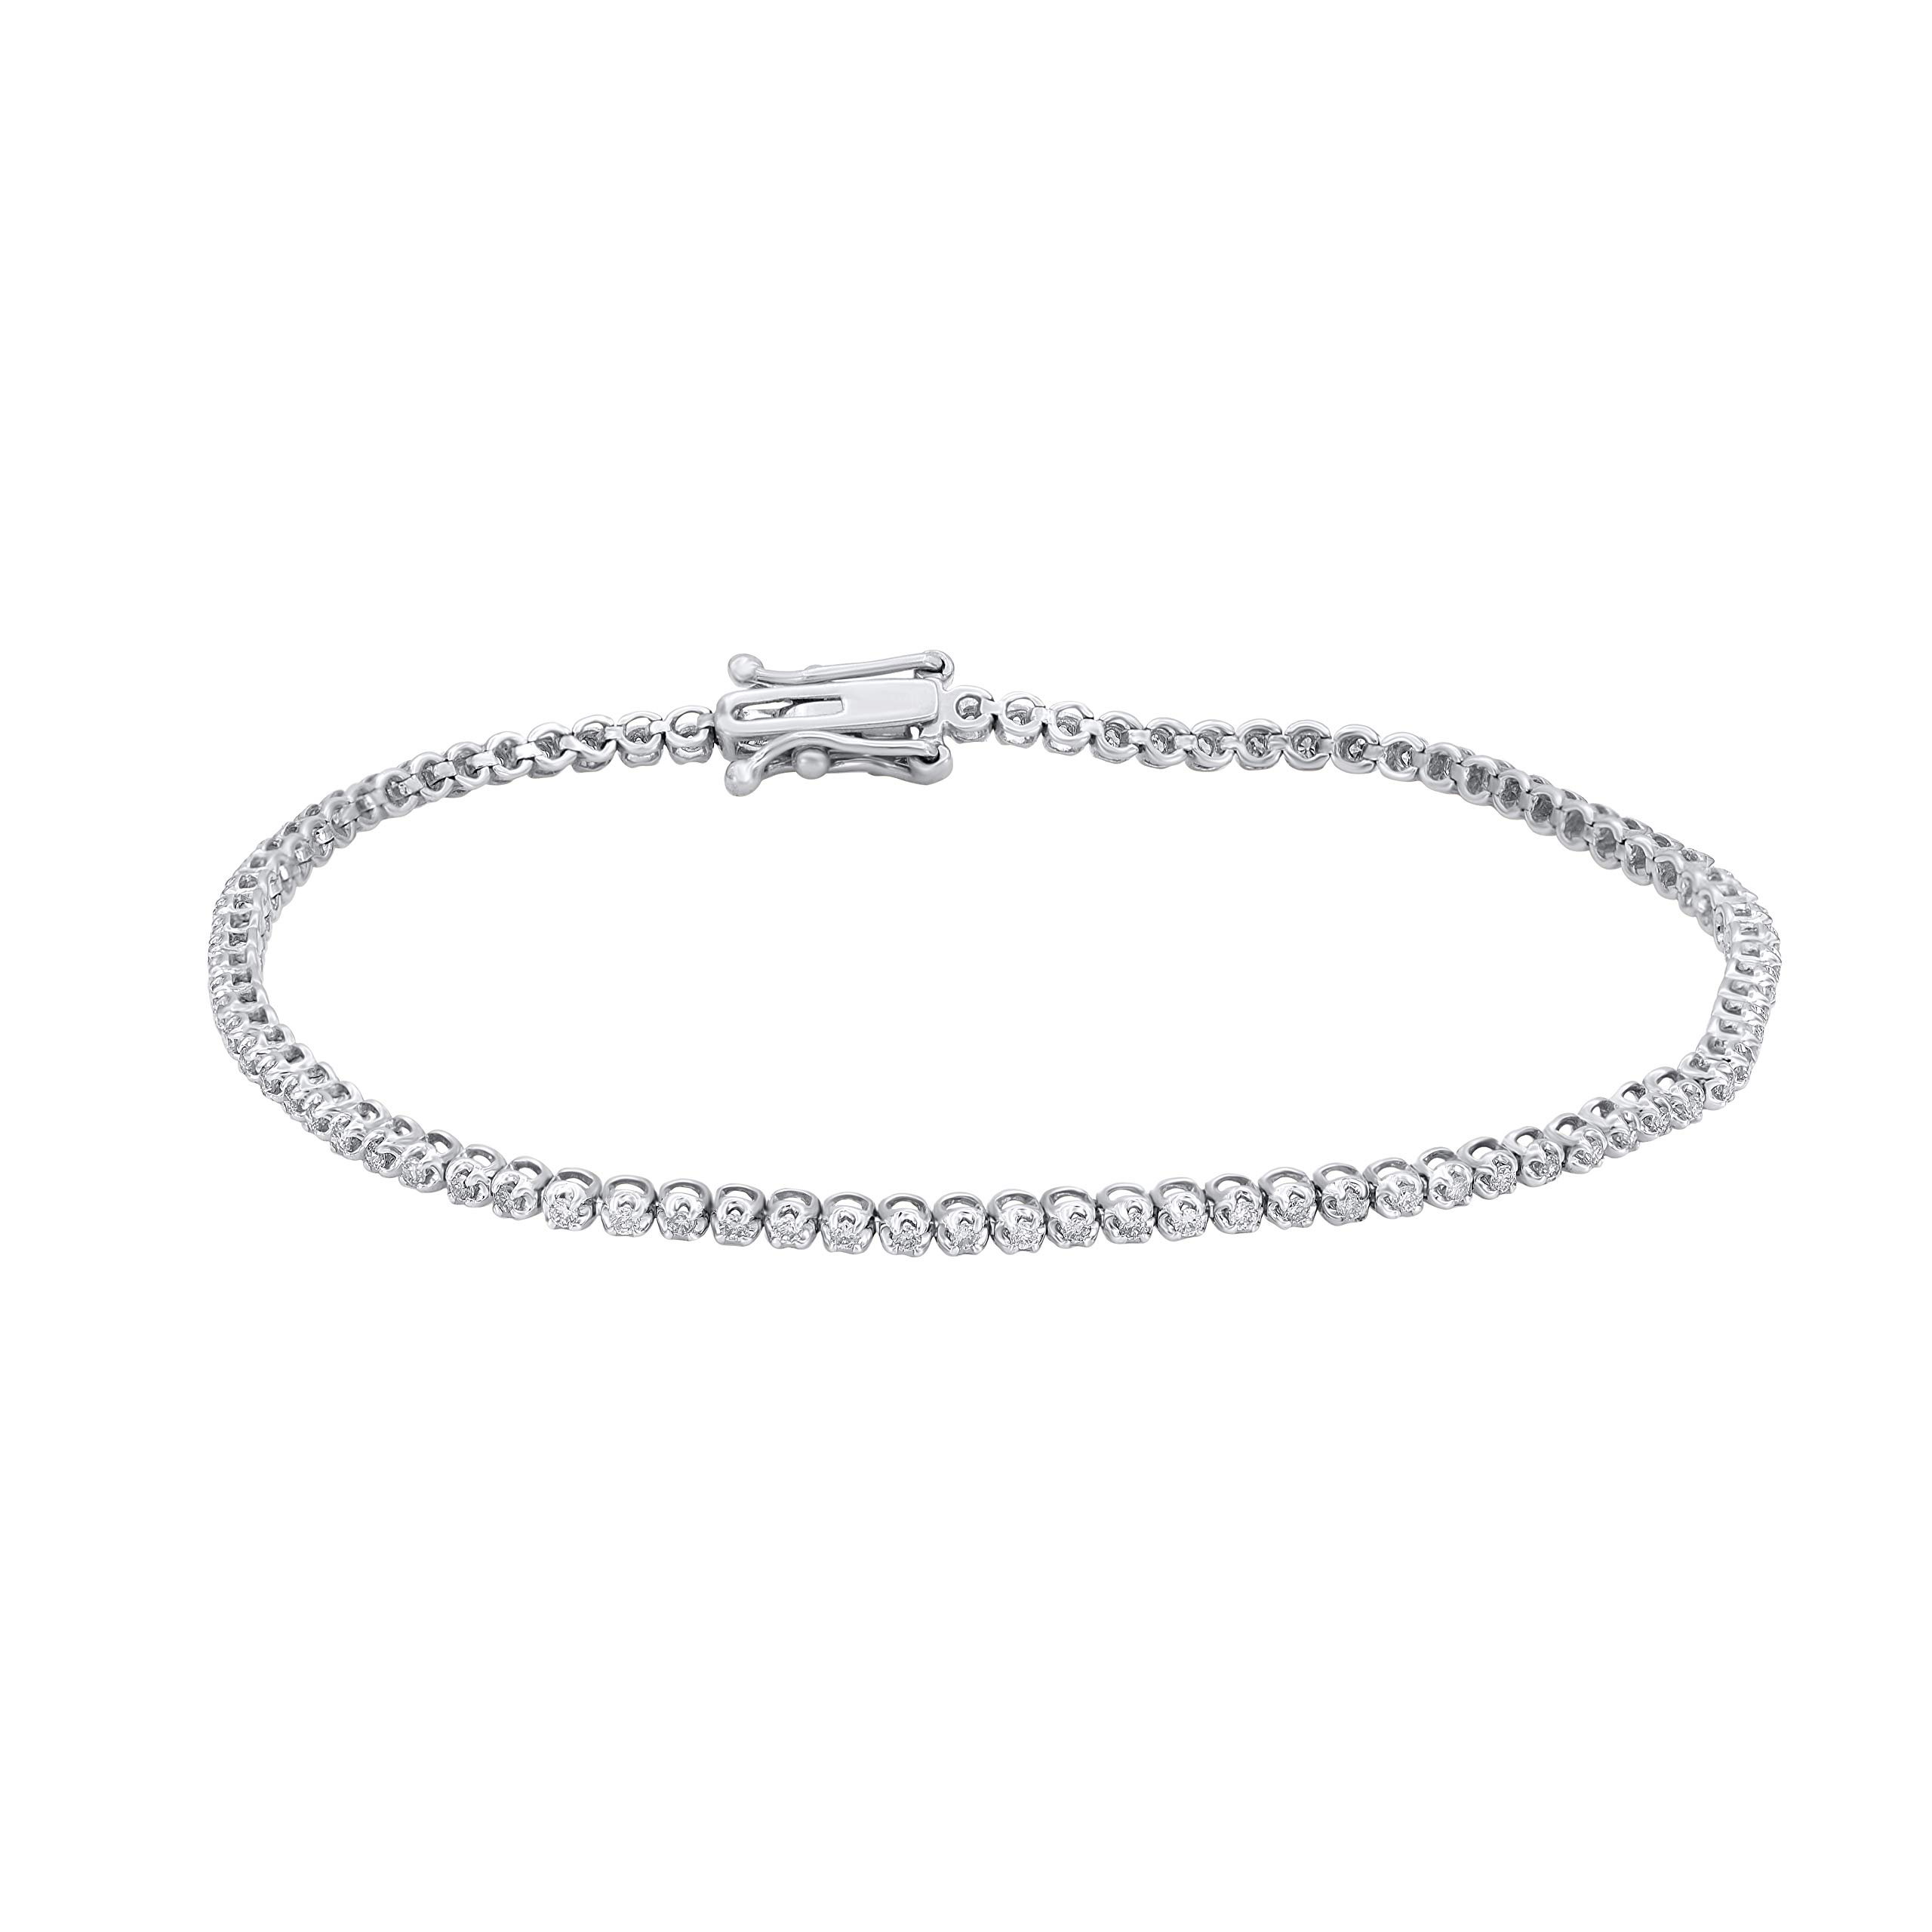 1/2 Carat Natural Diamond Bracelet 10K White Gold (M-N Color, I1-I2 Clarity) Diamond Tennis Bracelet for Women Diamond Jewelry Gifts for Women by TJD